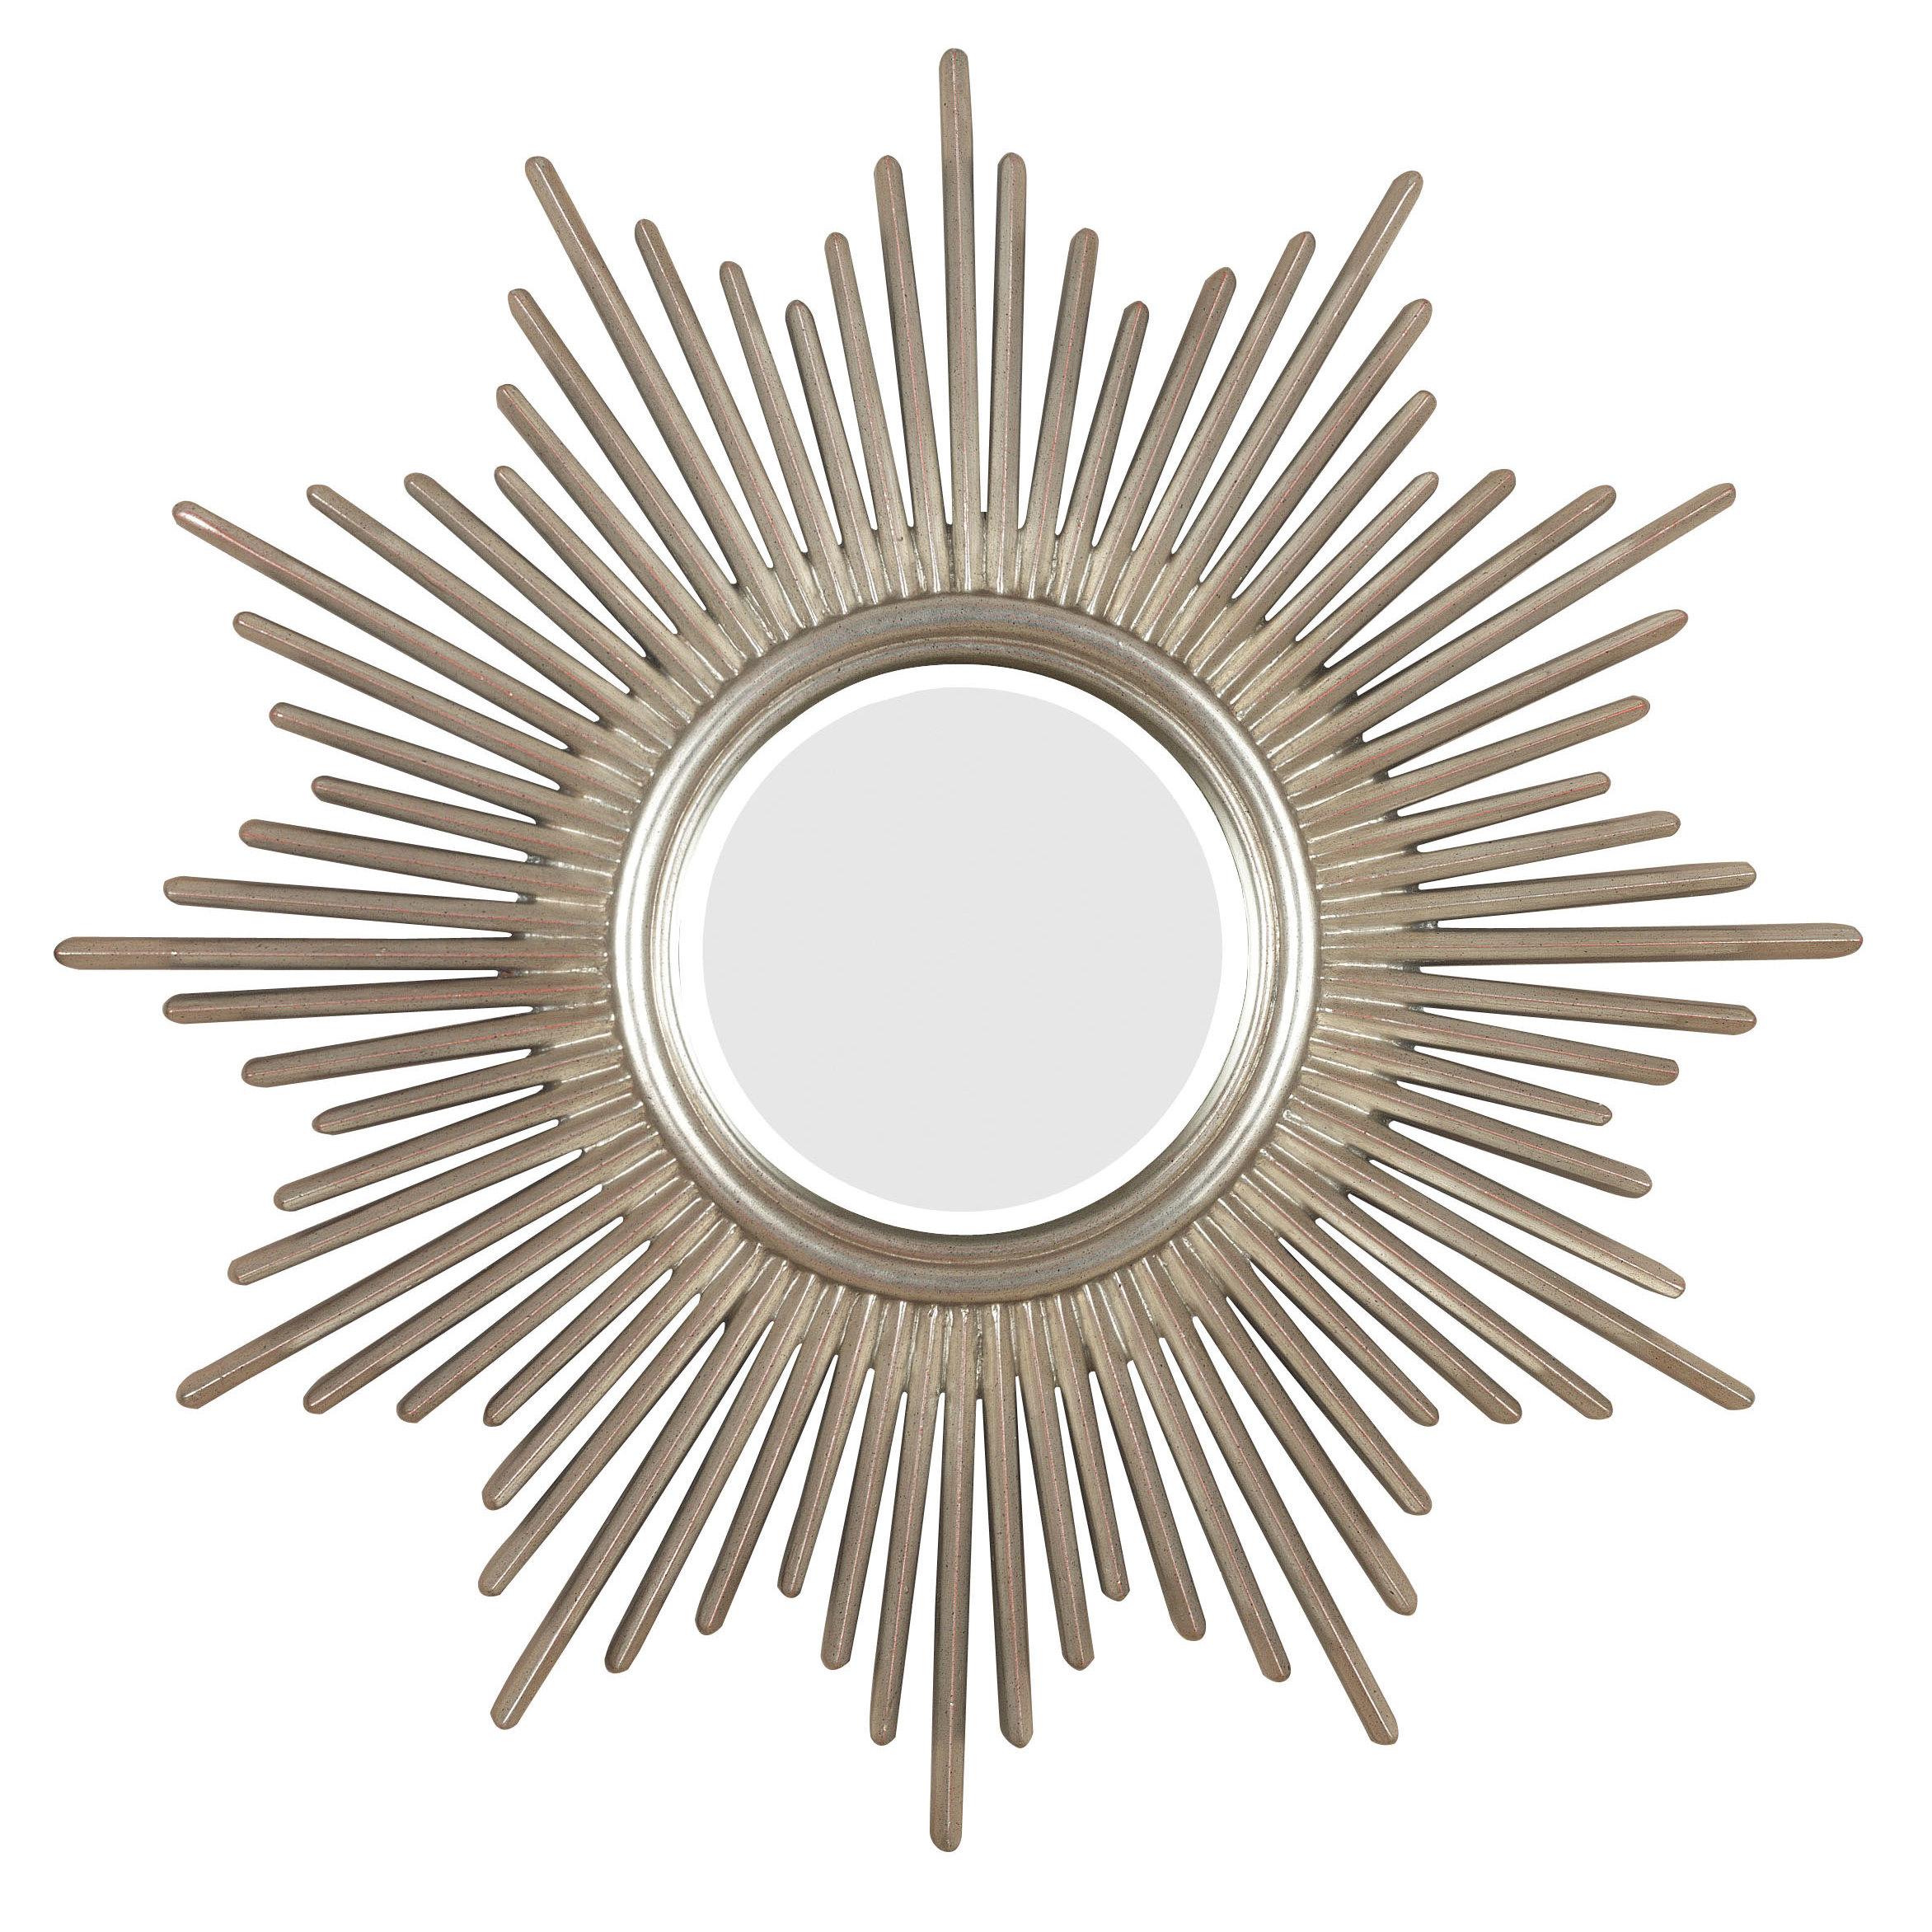 Josephson Starburst Glam Beveled Accent Wall Mirror For Estrela Modern Sunburst Metal Wall Mirrors (View 14 of 20)